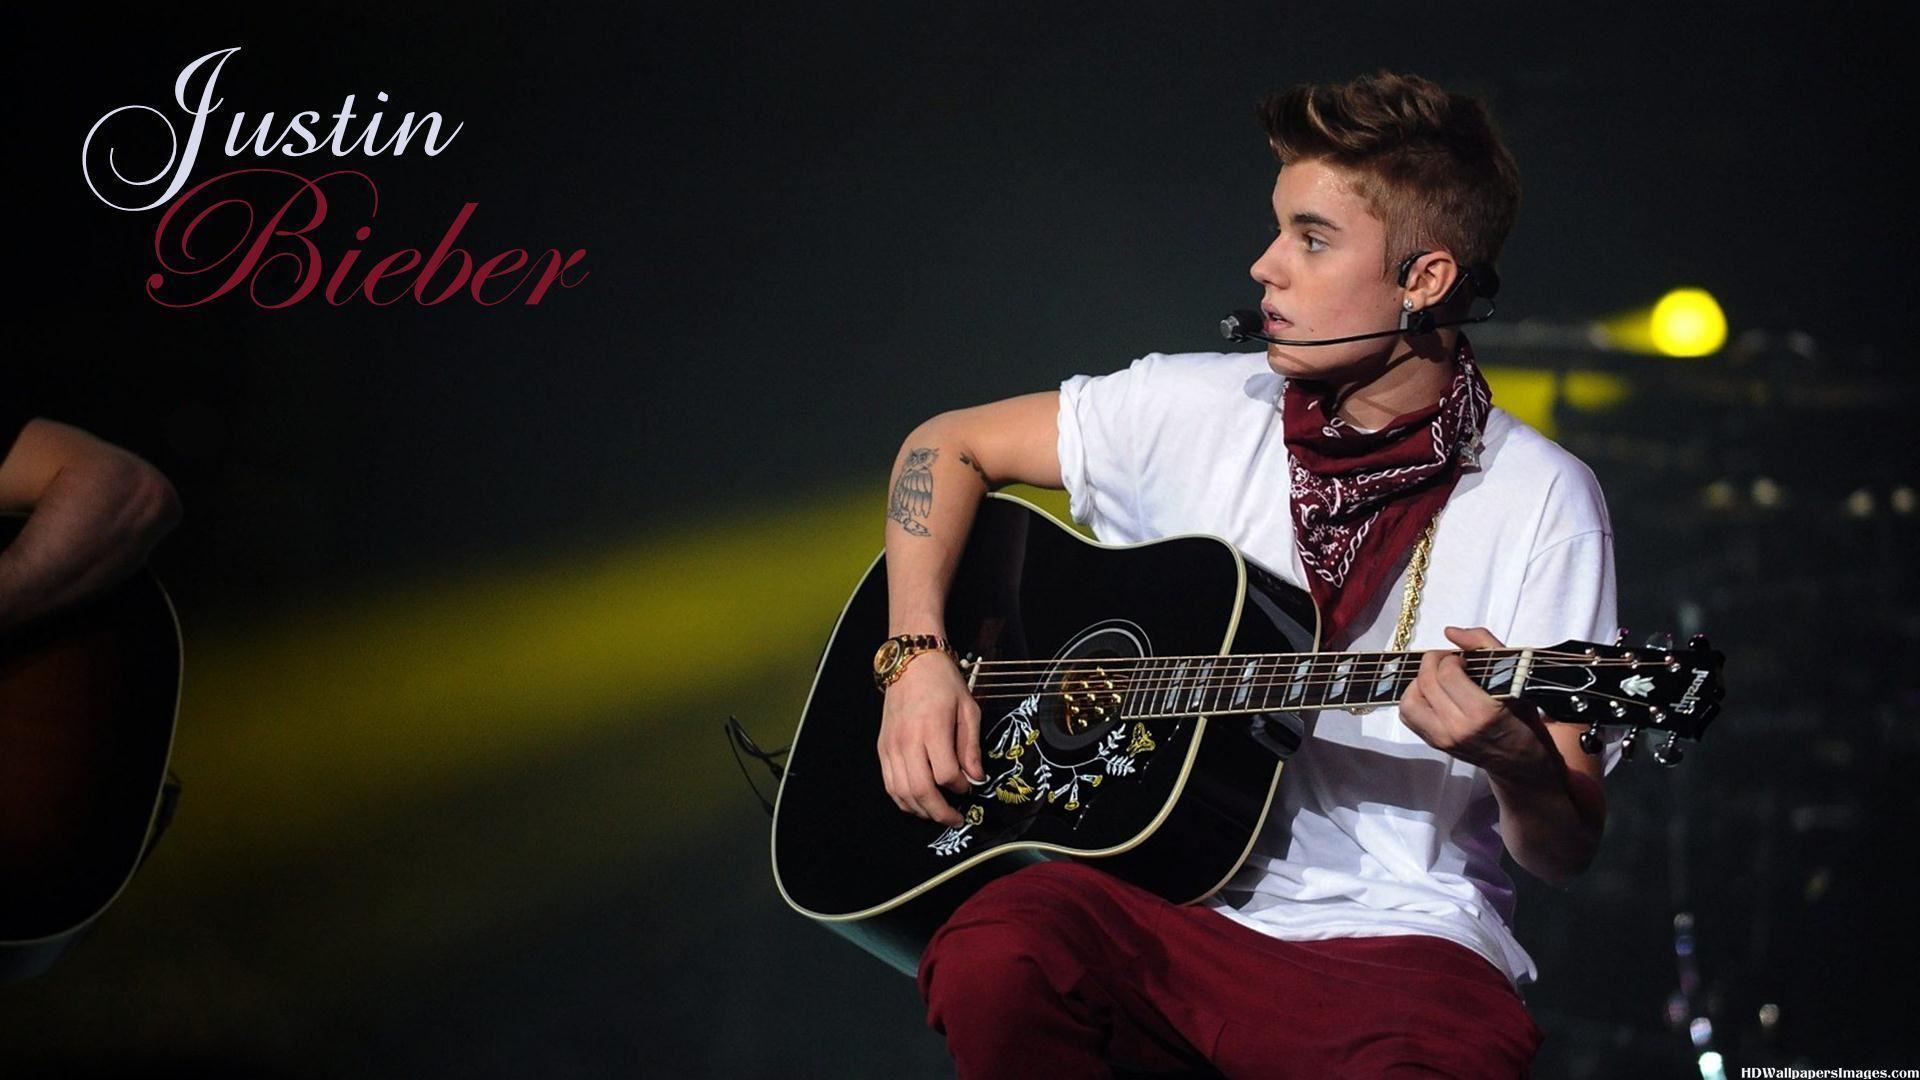 Justin Bieber 2015 Wallpapers - Wallpaper Cave  Justin Bieber 2...